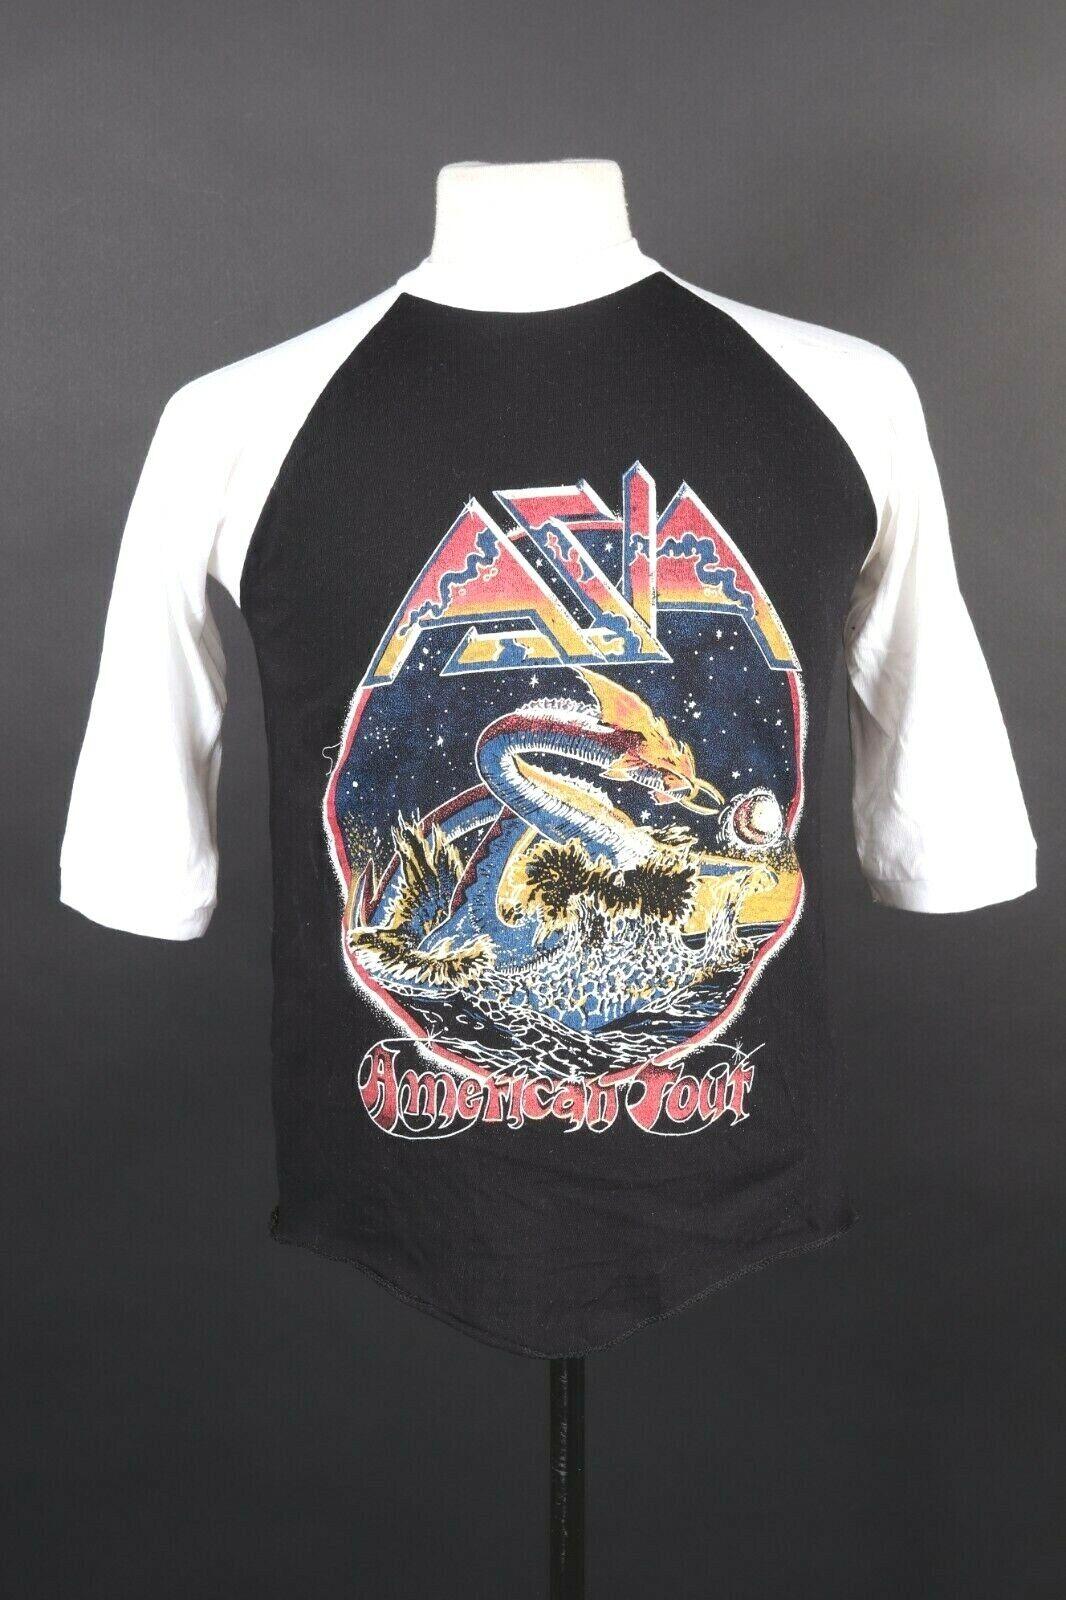 Vintage Sleep band Music Tour Concert Men Black Tee Cotton T-Shirt AV677